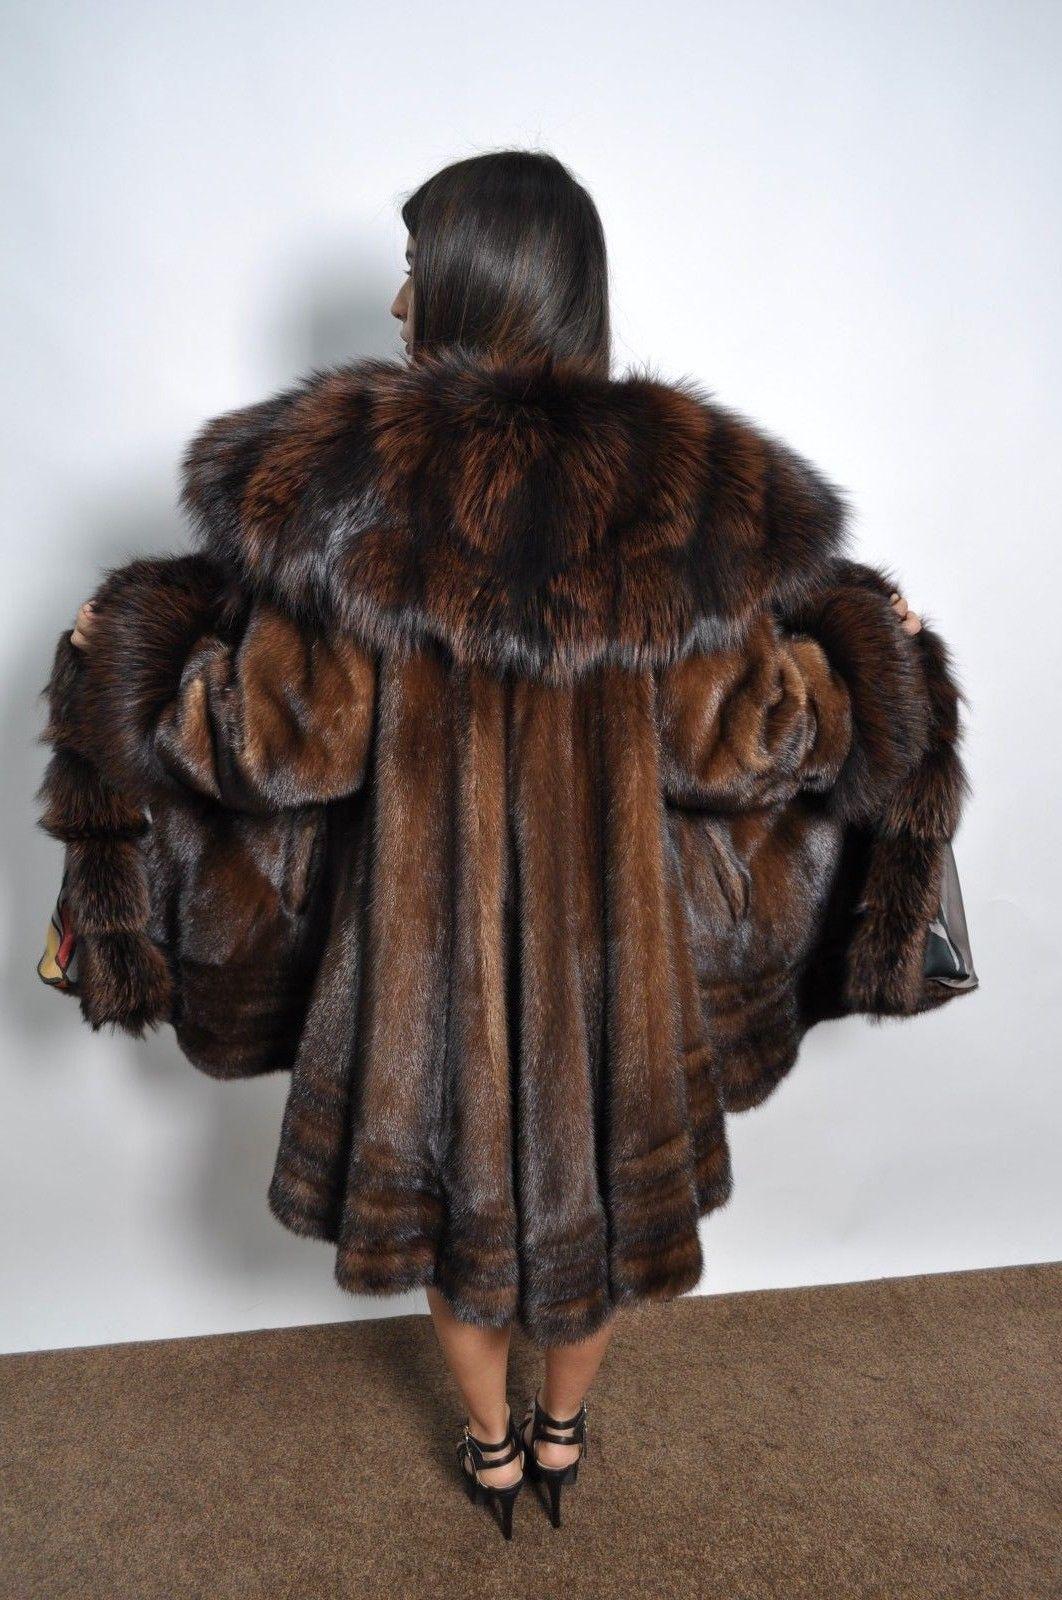 Brown Saga Mink Long Trench Fur Coat Class Jacket Chinchilla Fox Sable Vest Fur Coat Fur Fur Coats Women [ 1600 x 1062 Pixel ]